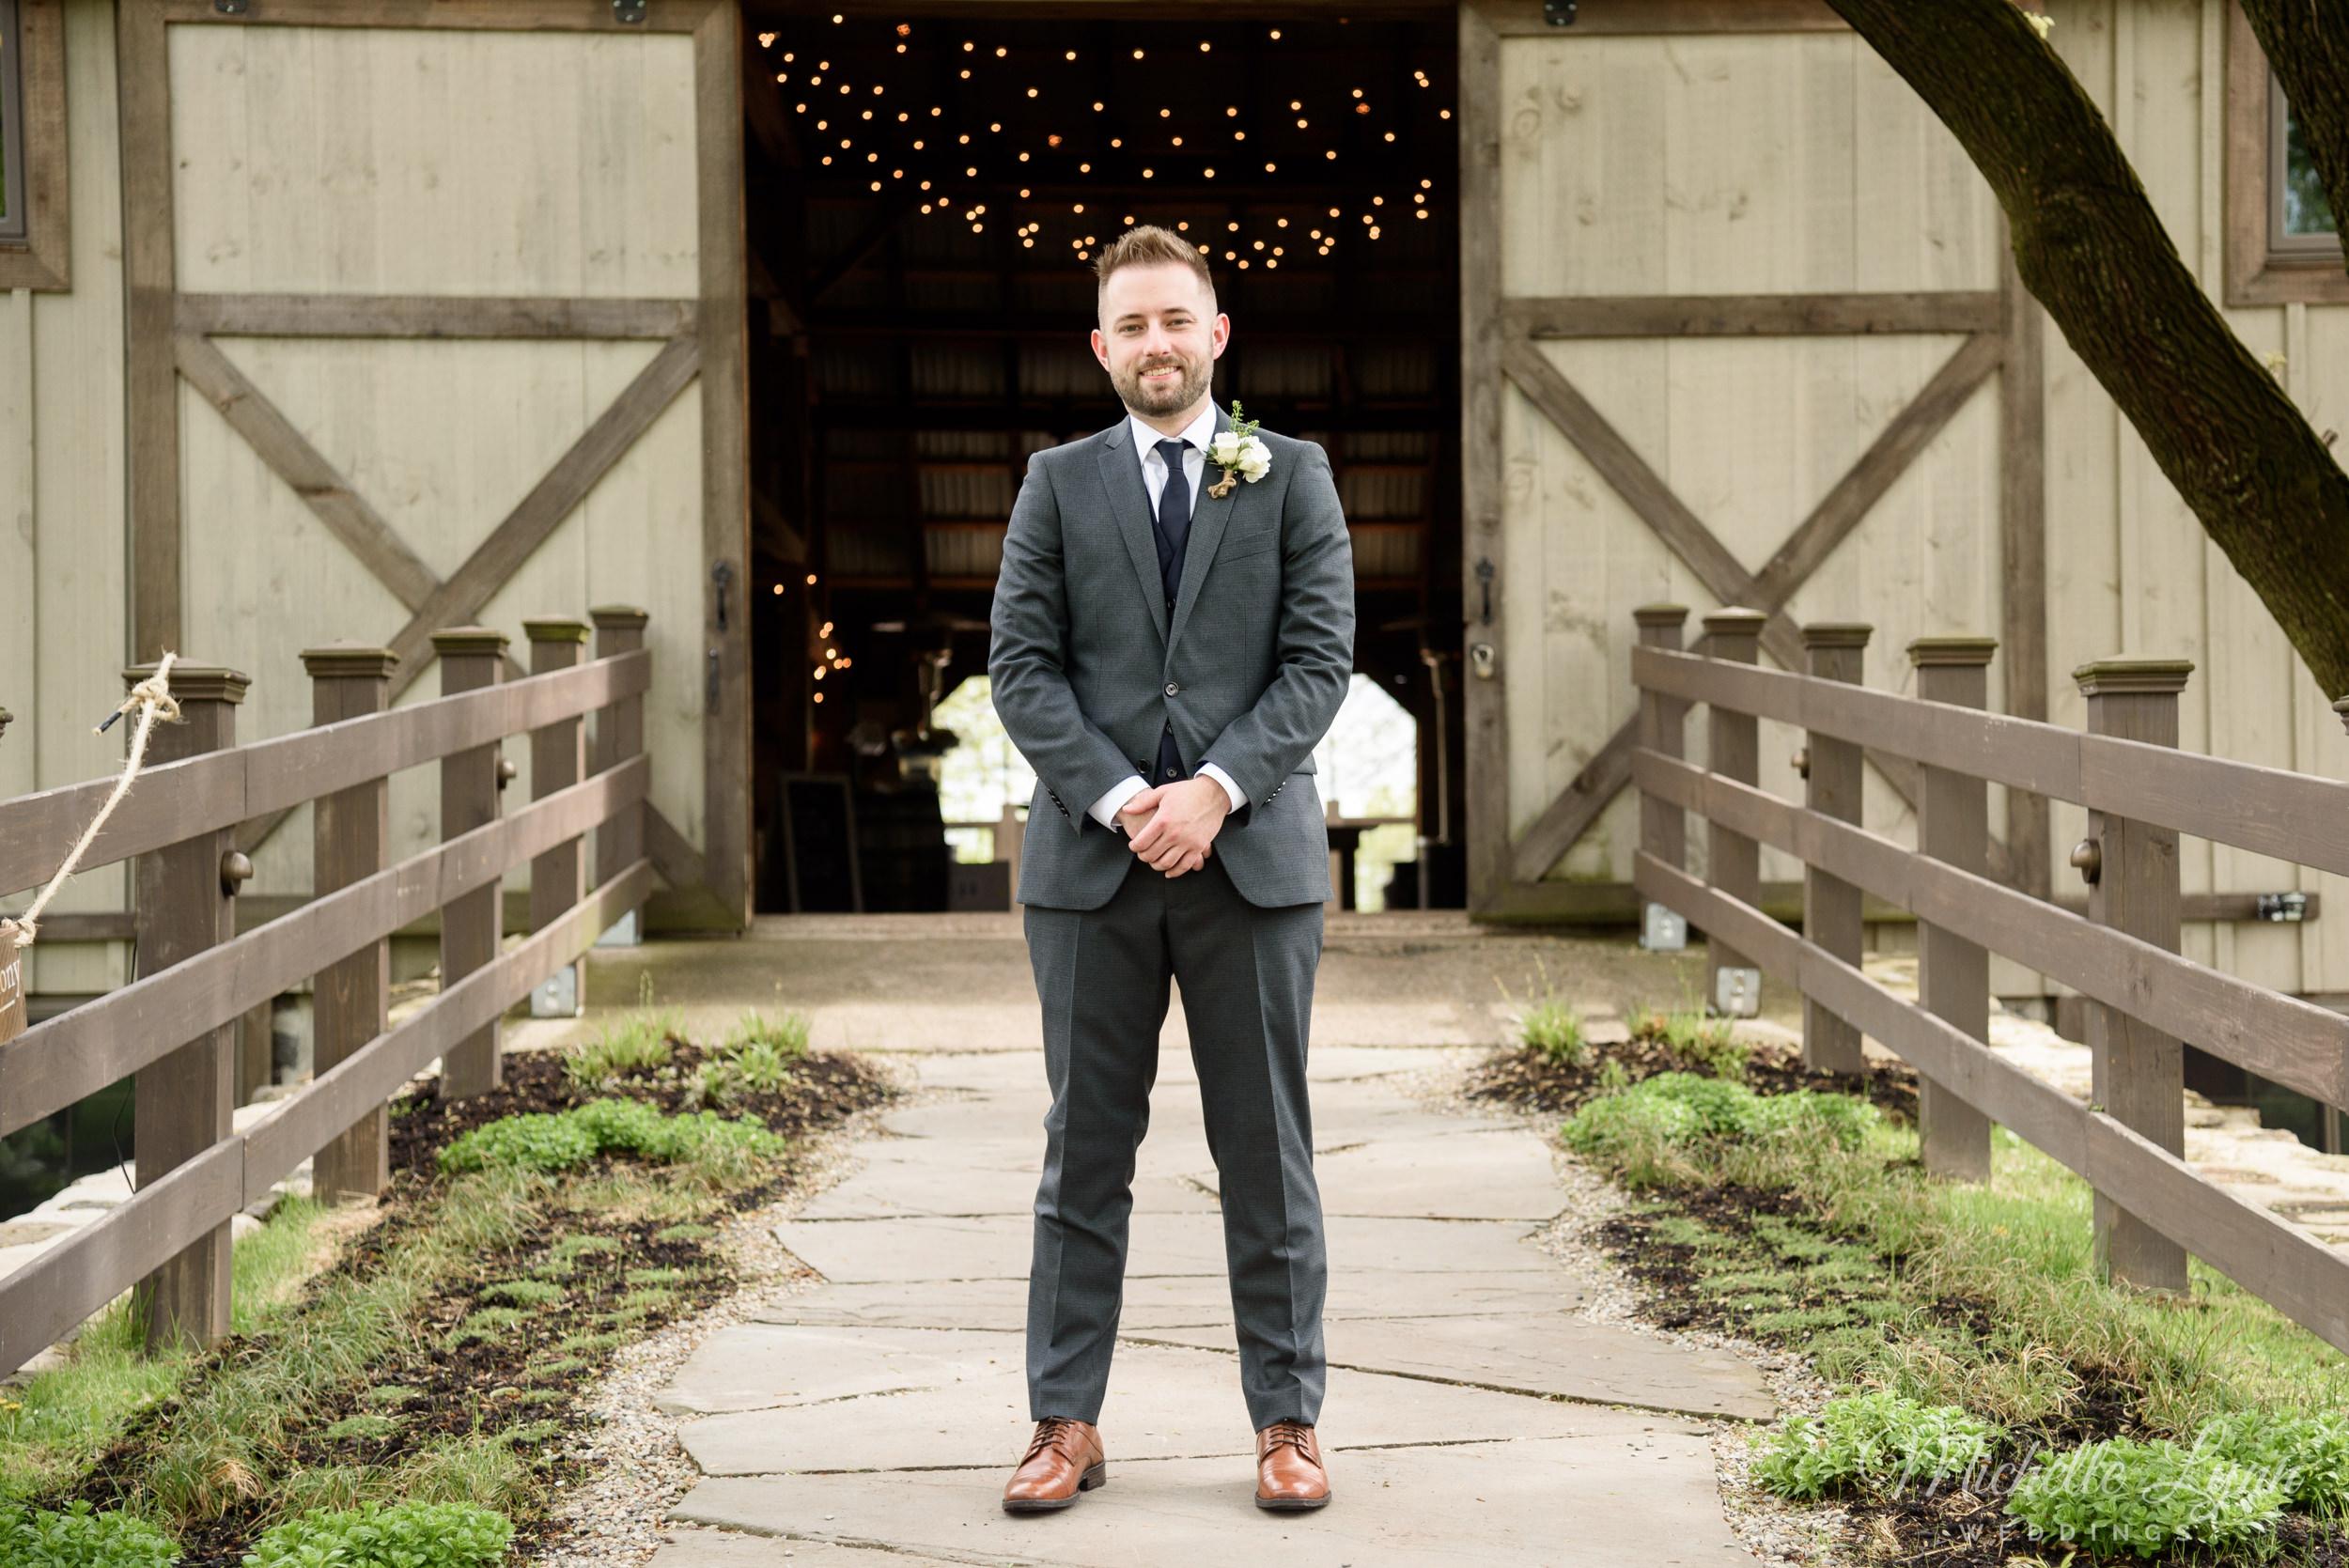 mlw-the-farm-bakery-and-events-wedding-photos-23.jpg